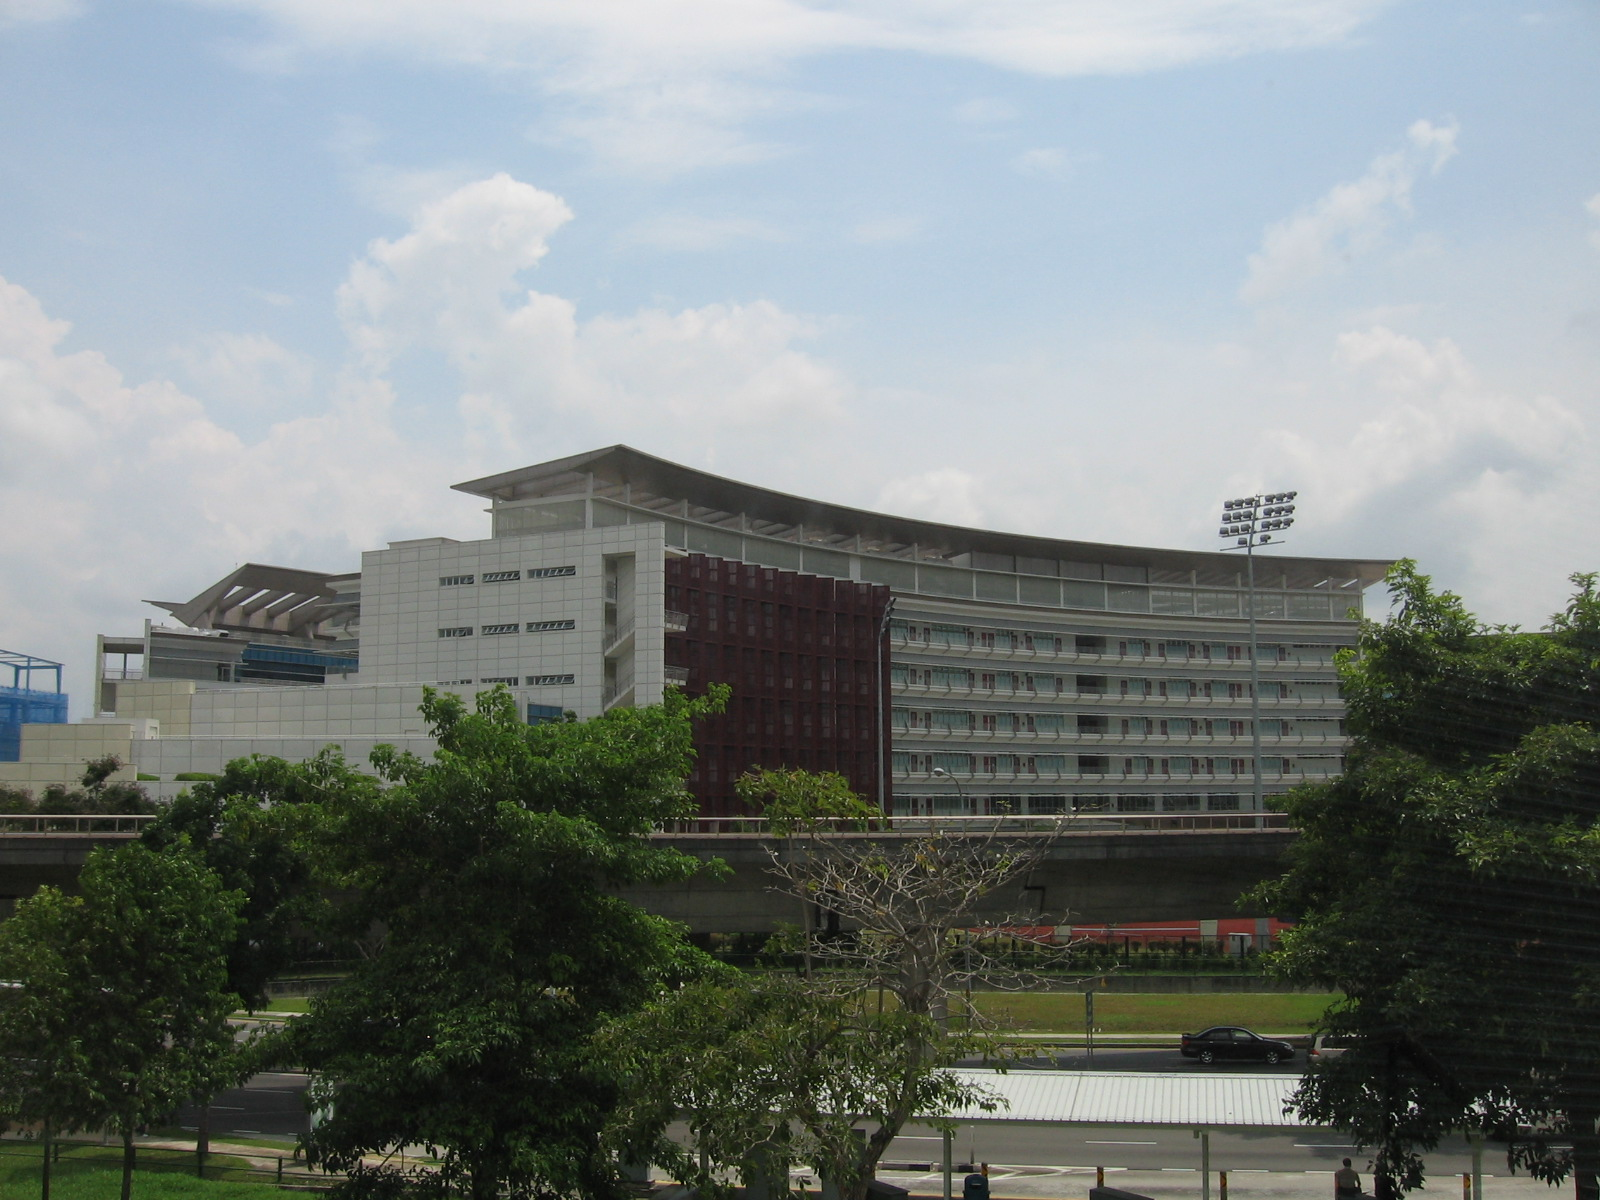 File:ITE COLLEGE EAST, Simei Campus, Jul 06.JPG - Wikipedia, the ...